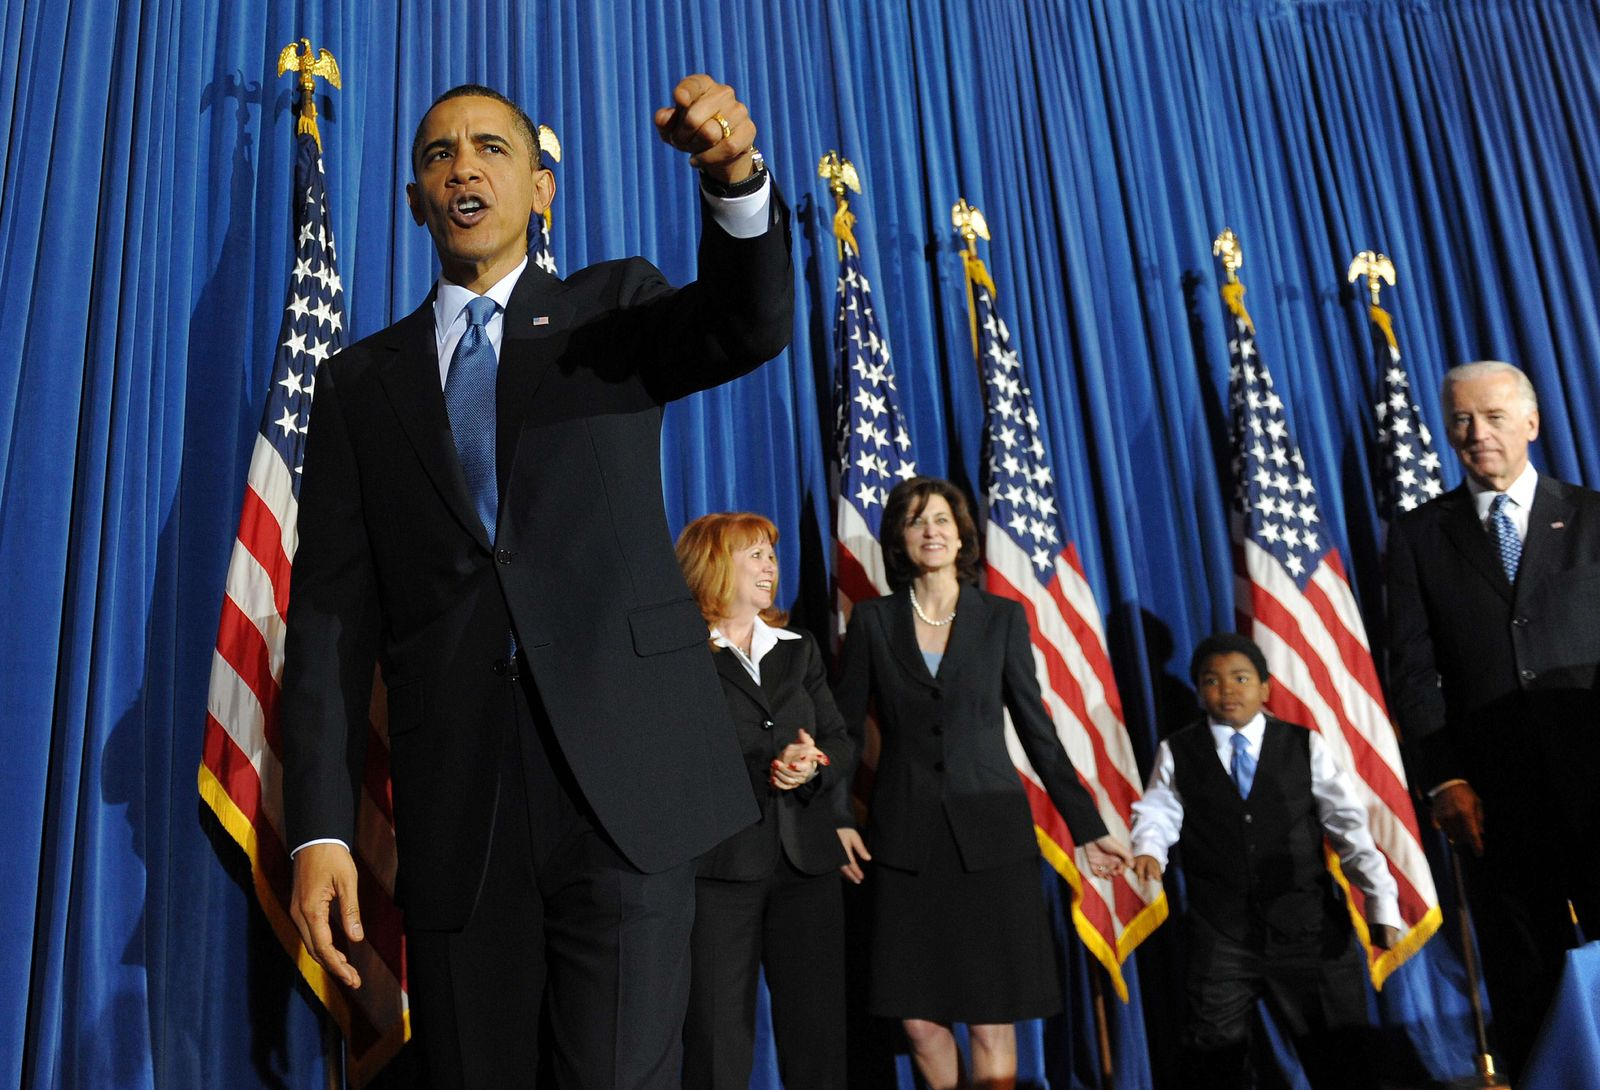 Obama / Obamacare